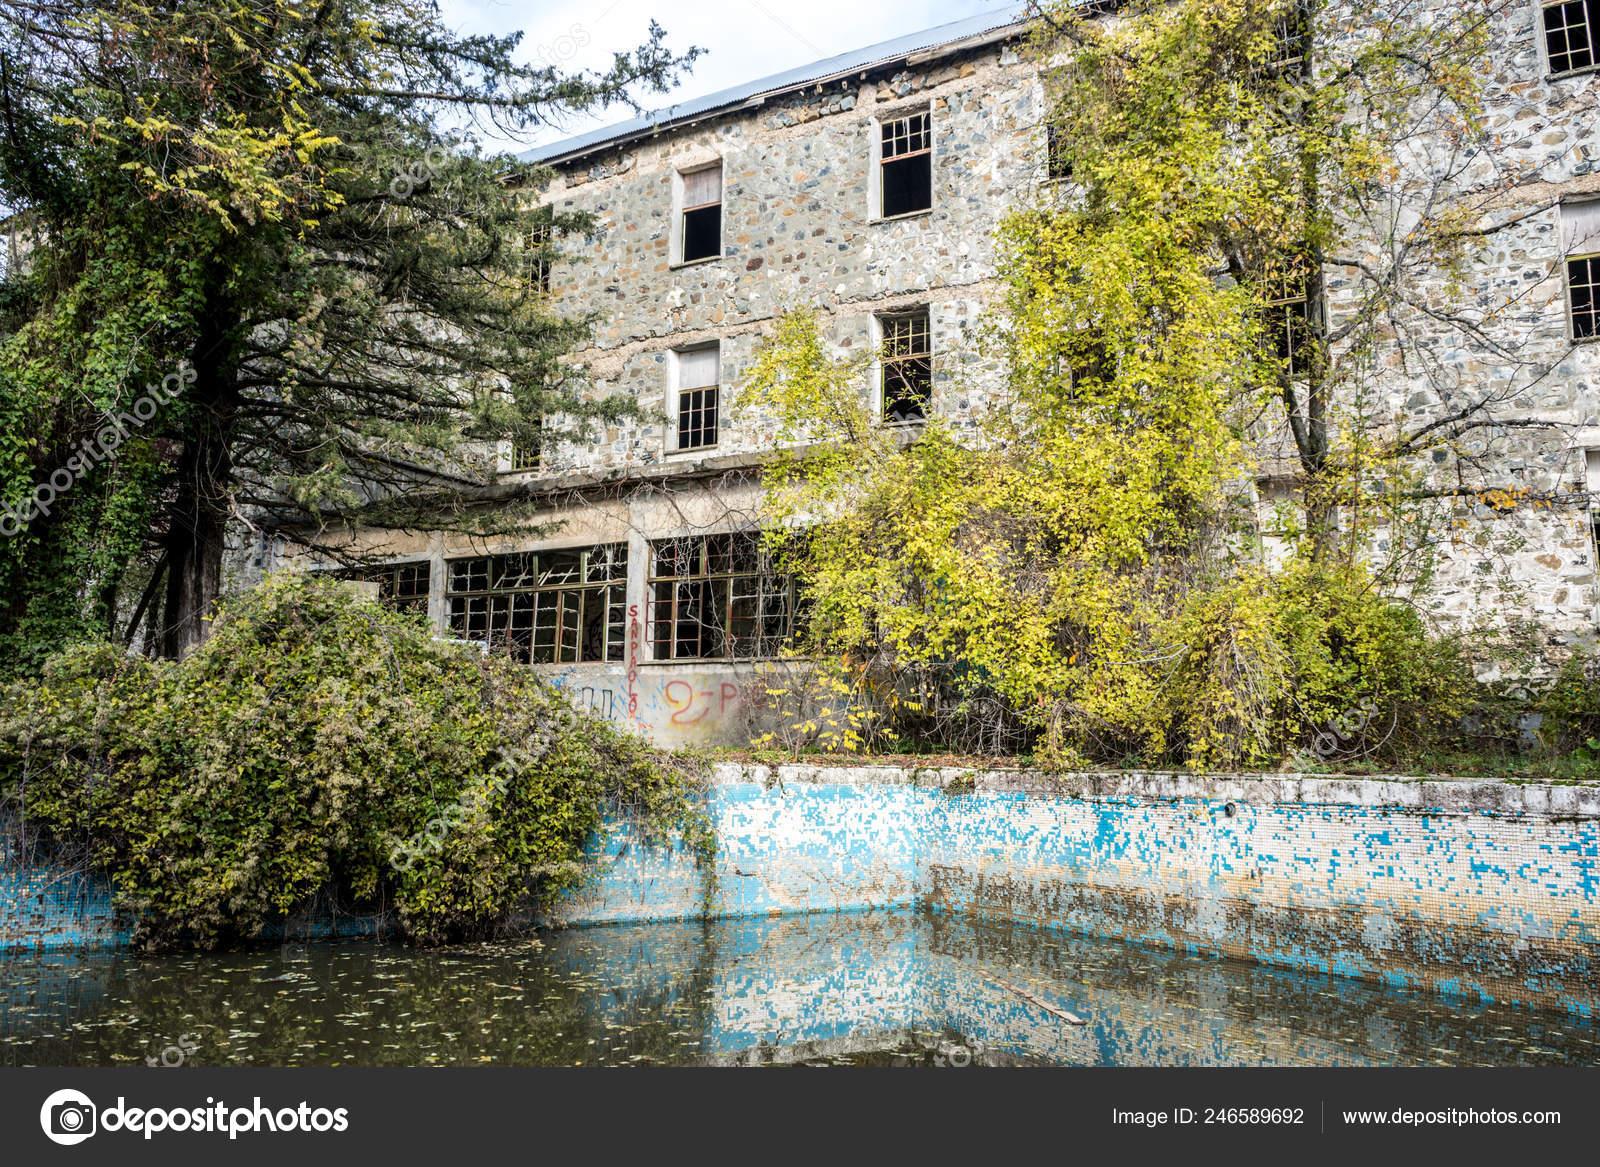 Swimming Pool Area Berengaria Abandoned Hotel Mountain Region Trodos Cyprus Stock Photo C Aleksandrbazinlt Gmail Com 246589692